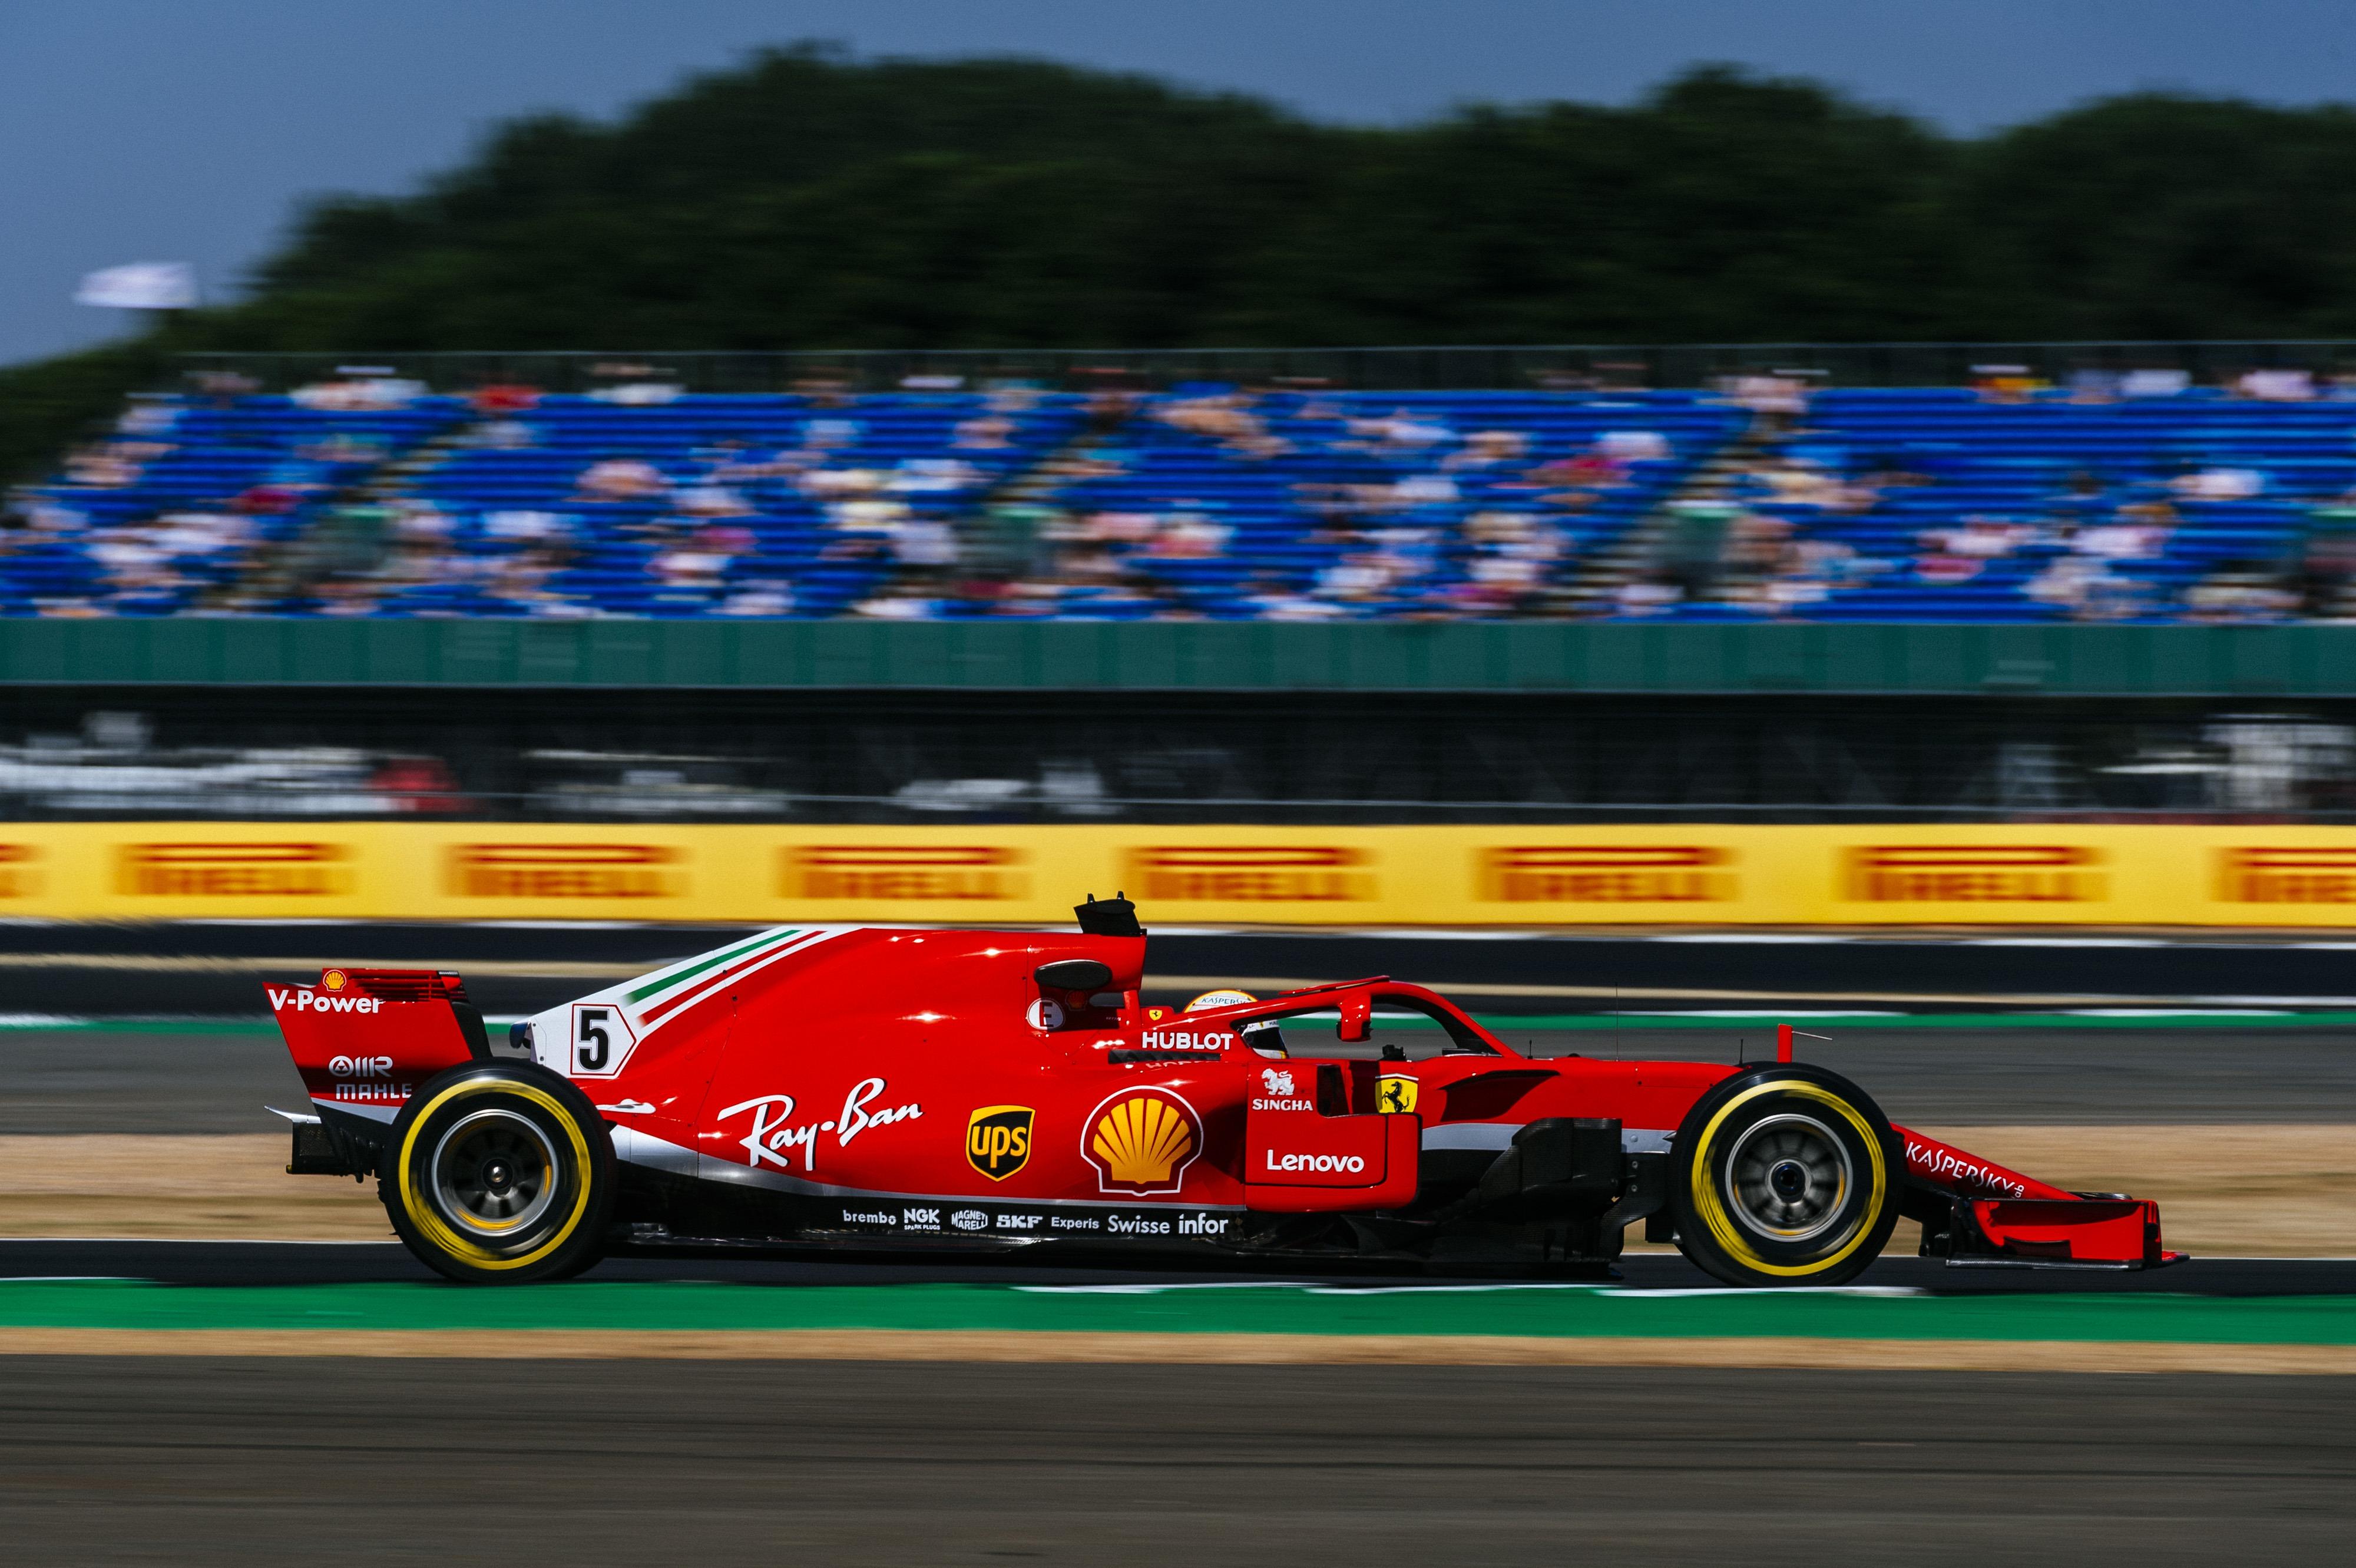 Lap times 2nd practice 2018 British F1 Grand Prix